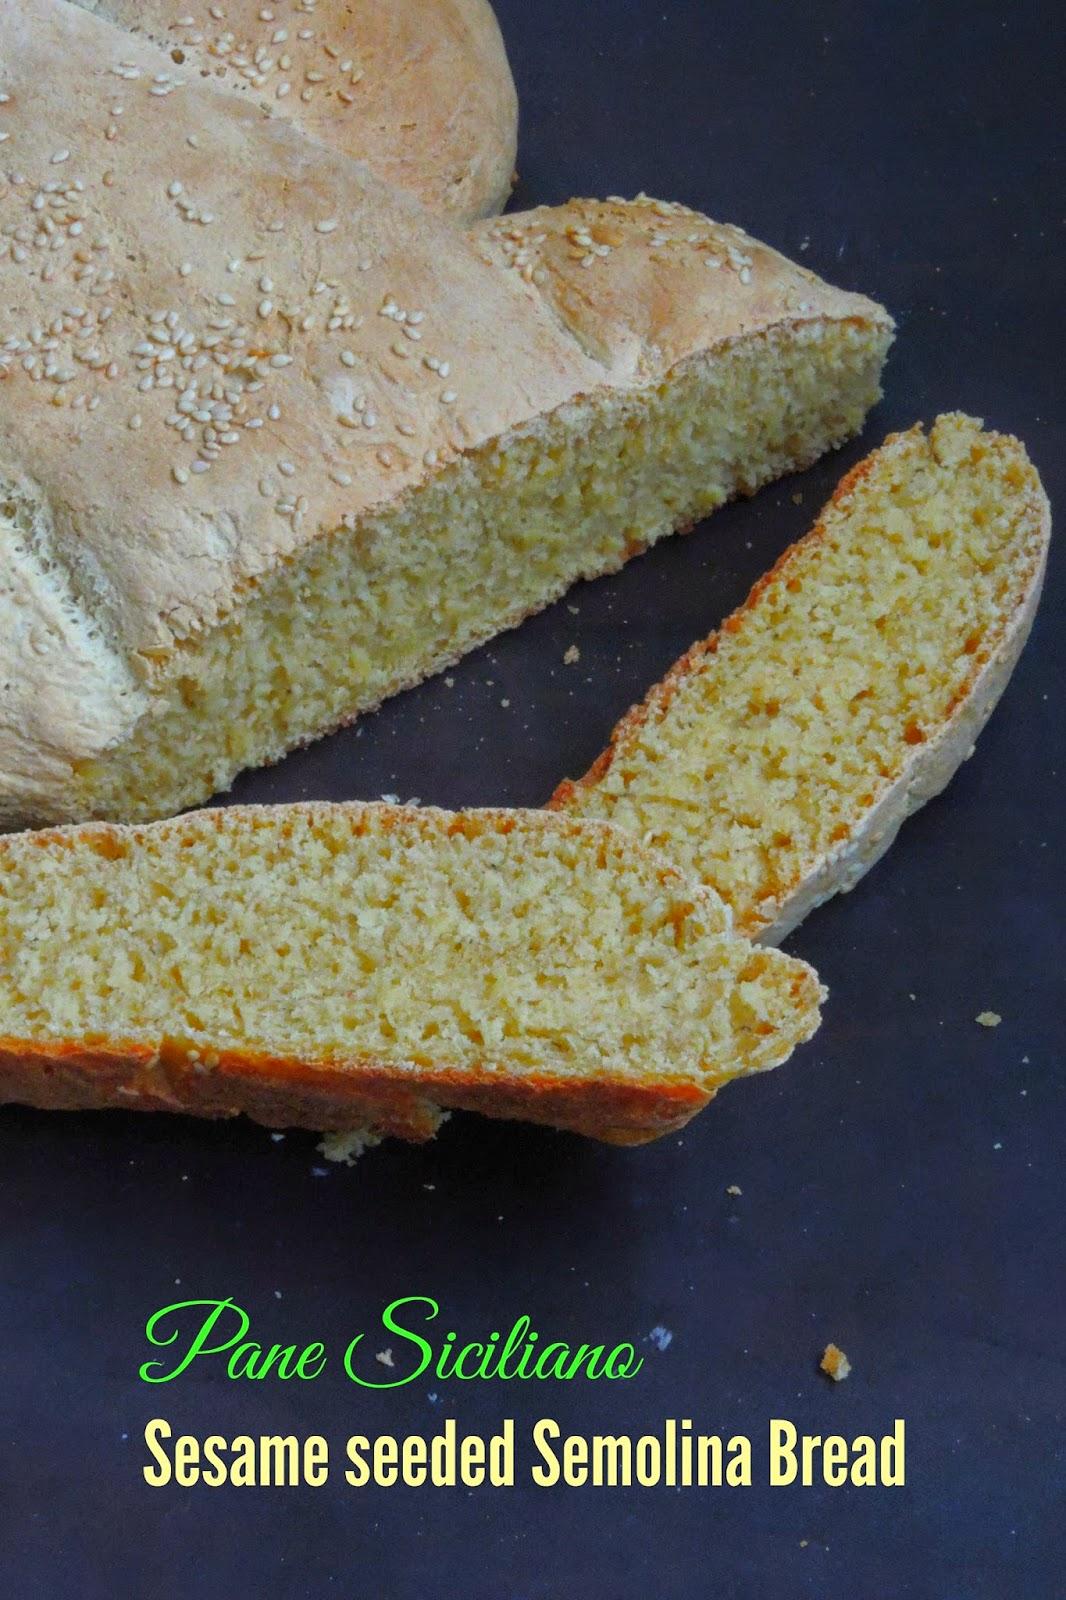 Sesame seeded Semolina Bread